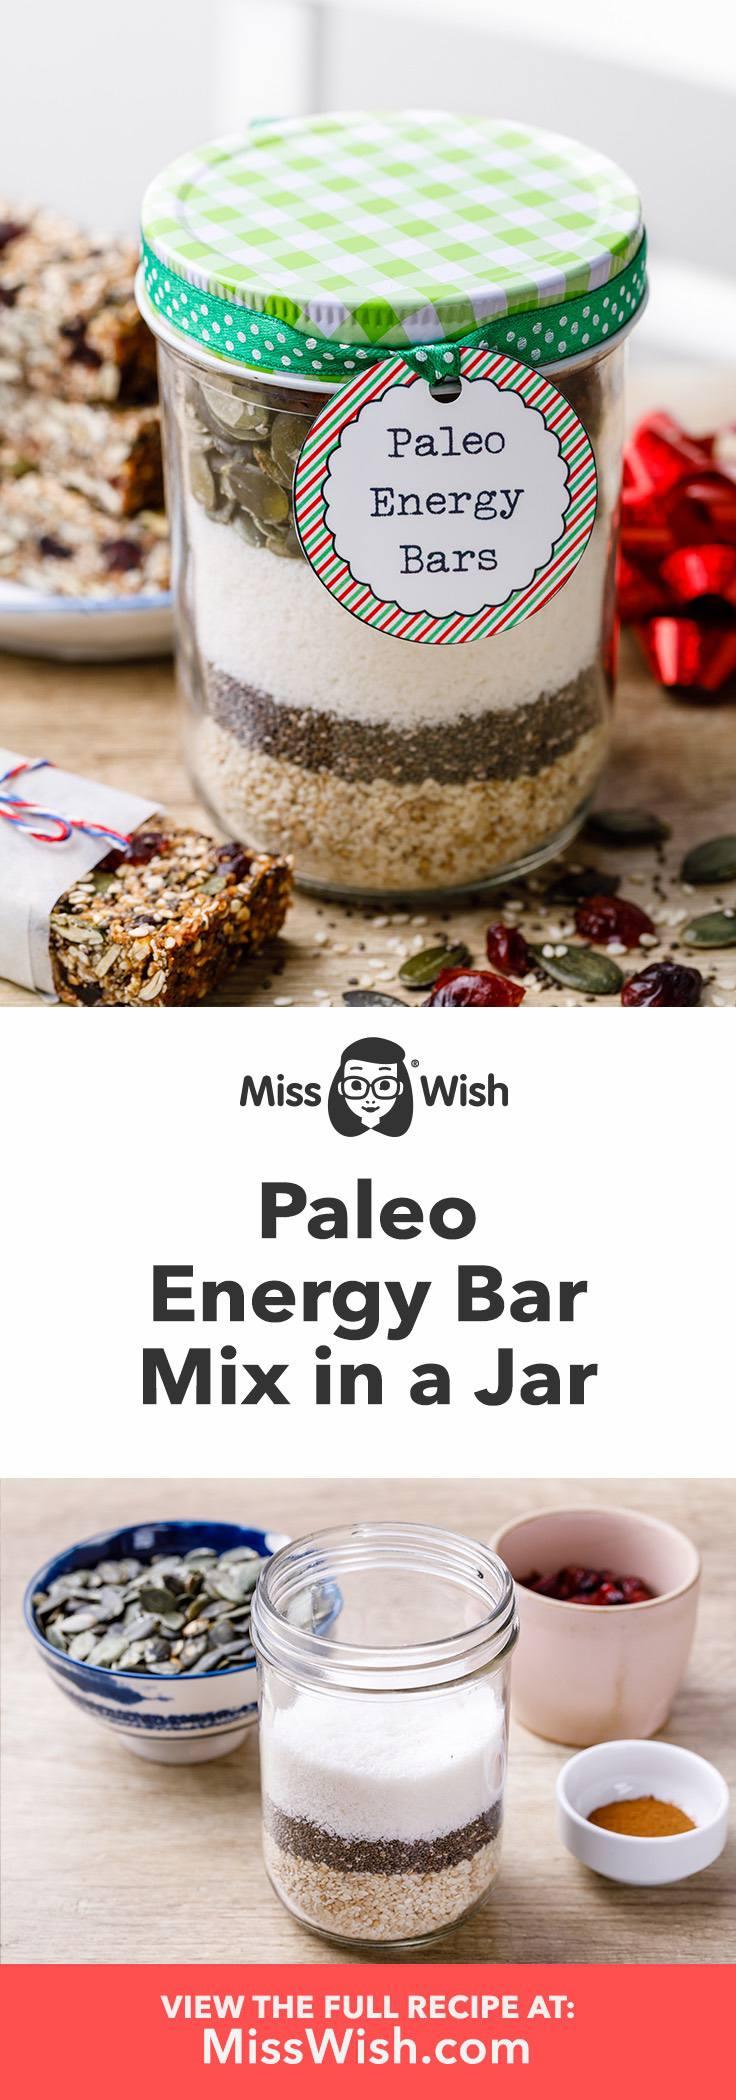 Easy make-ahead paleo energy bar mix.